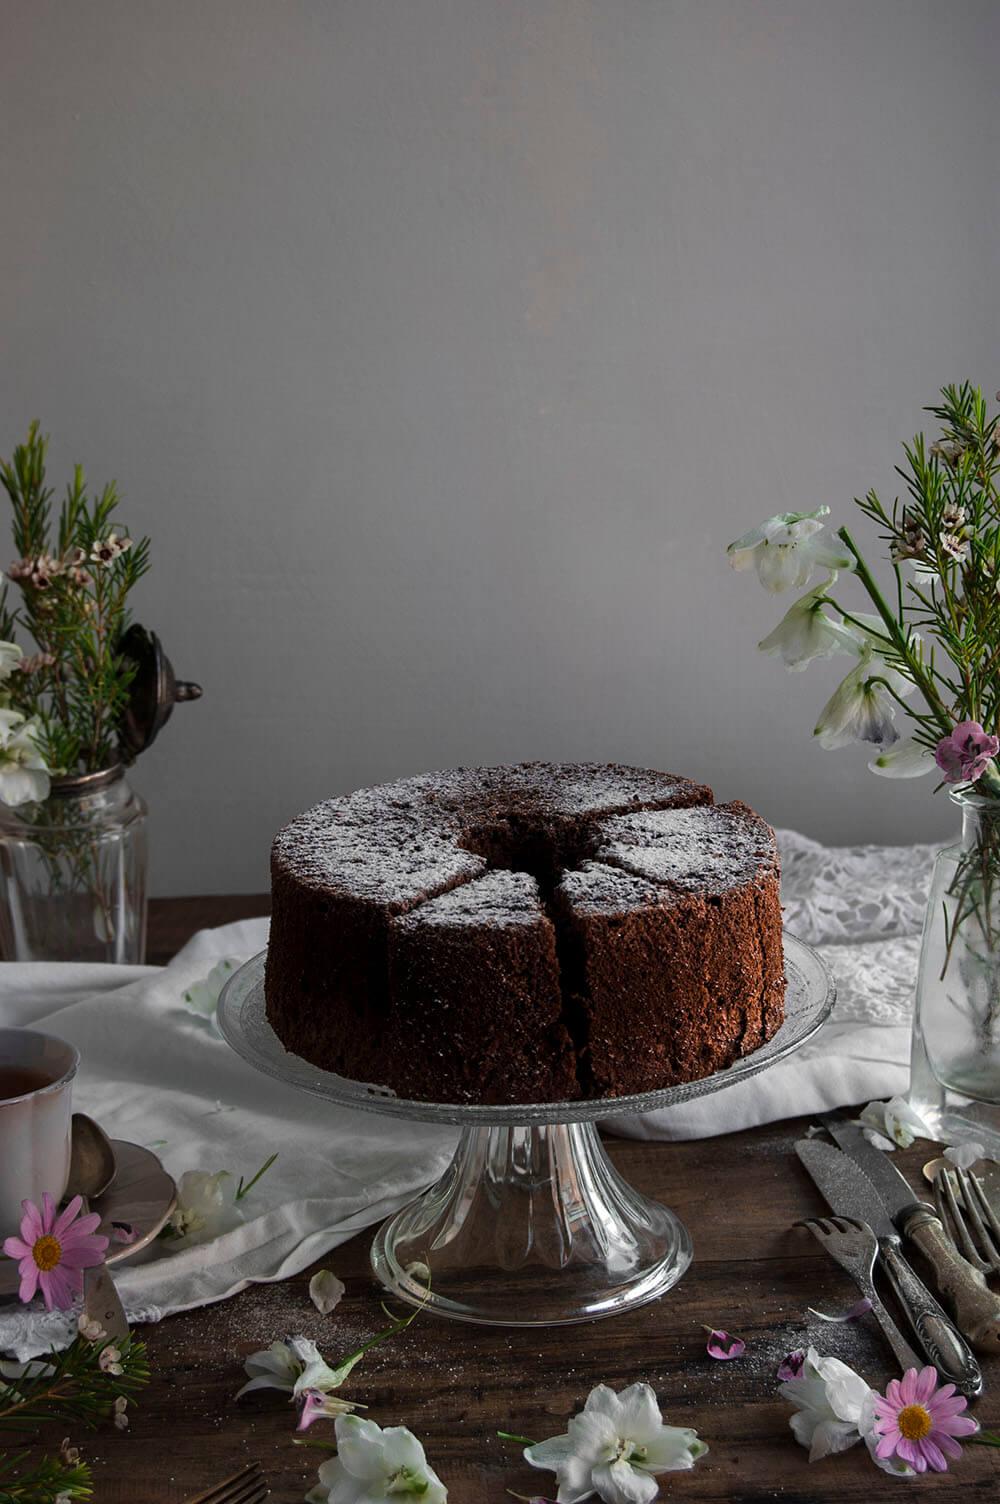 angel food cake de chocolate